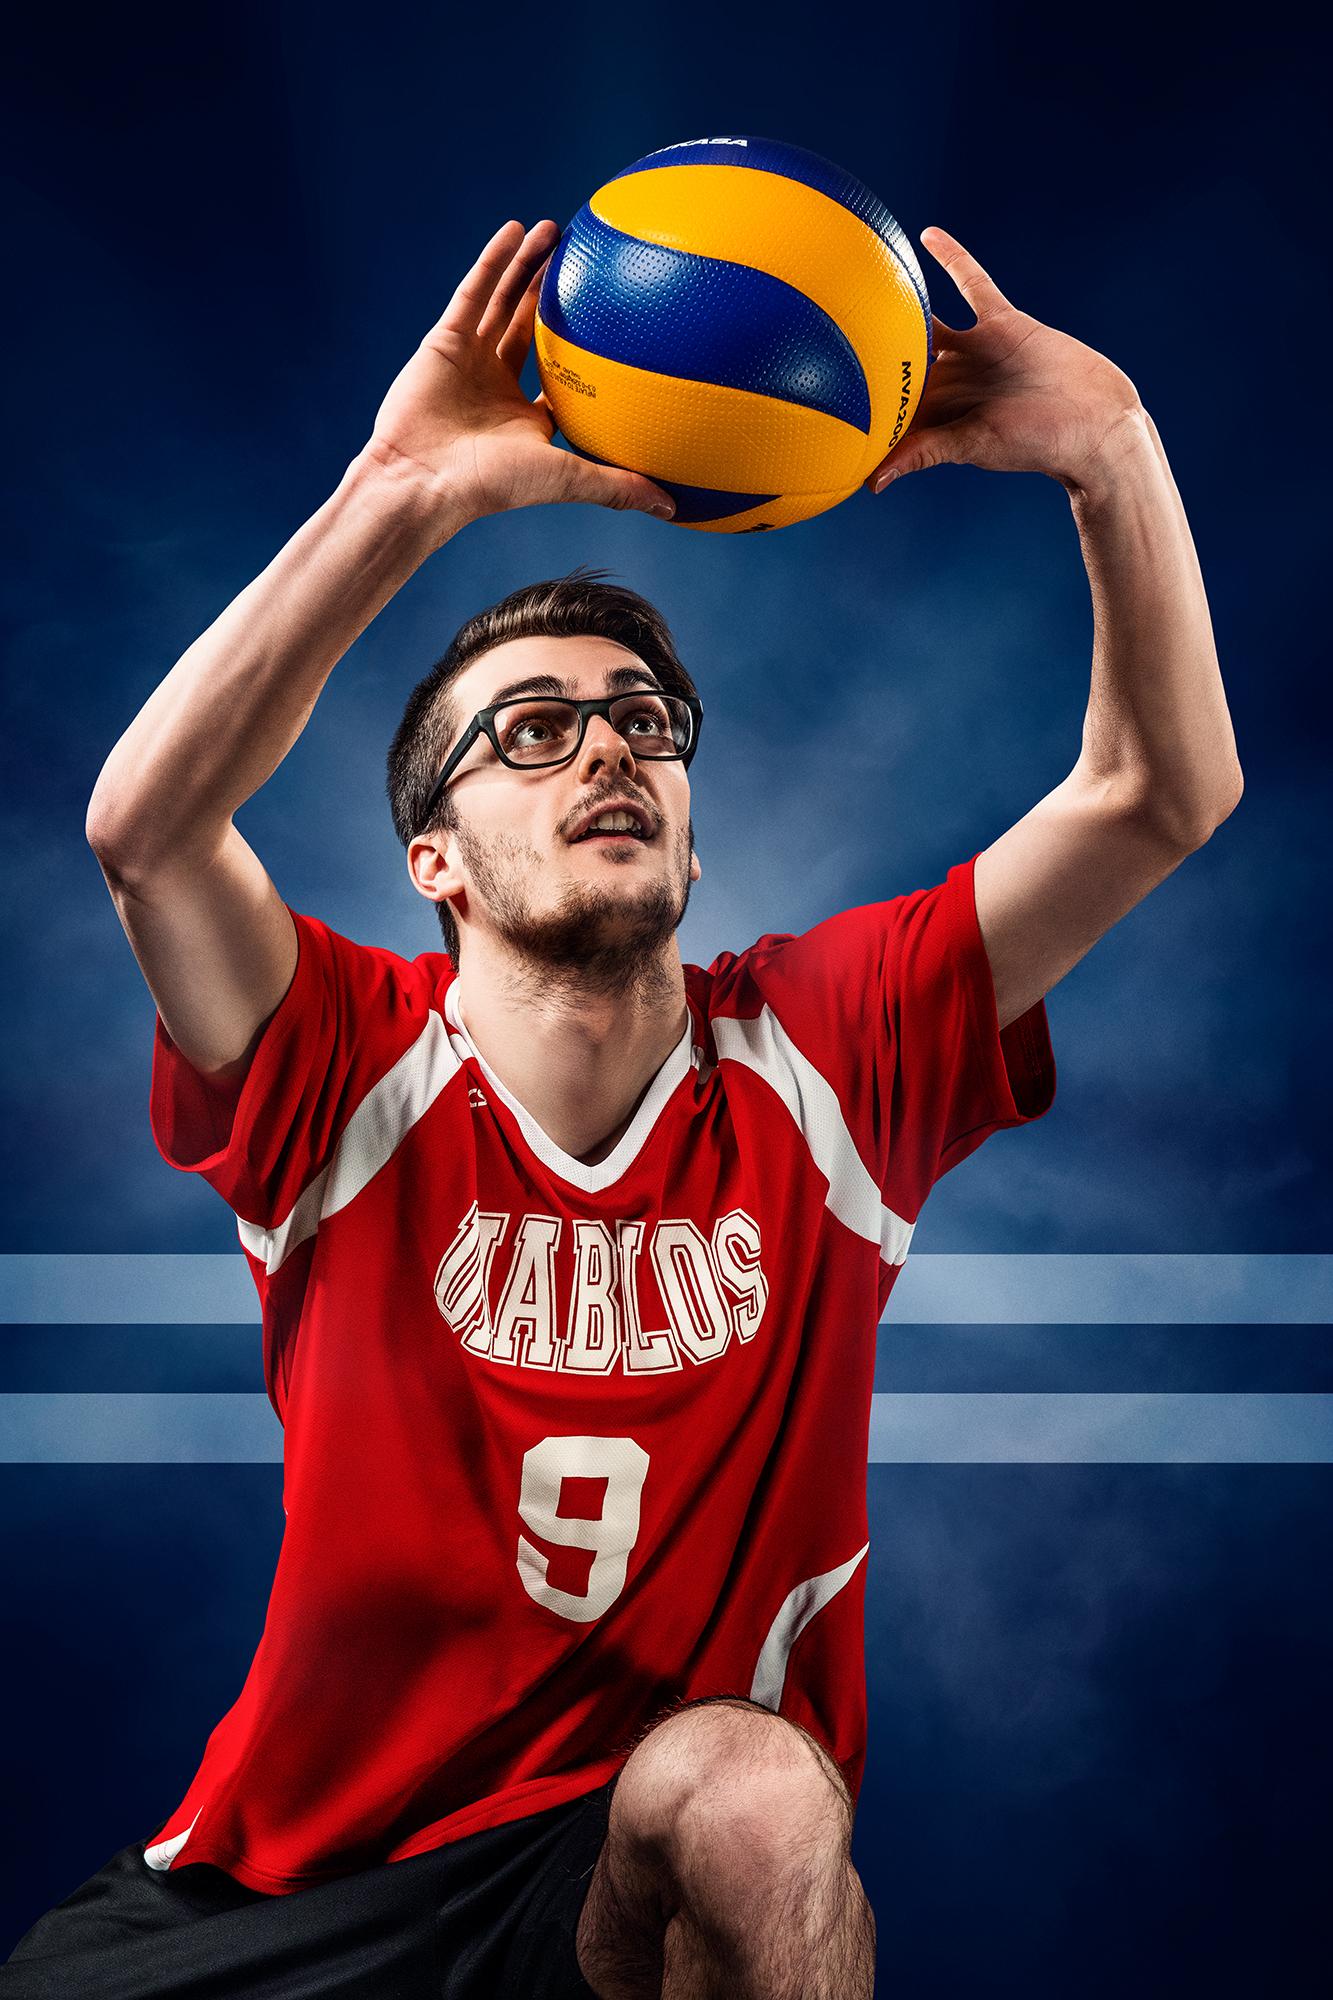 joueur volleyball en action